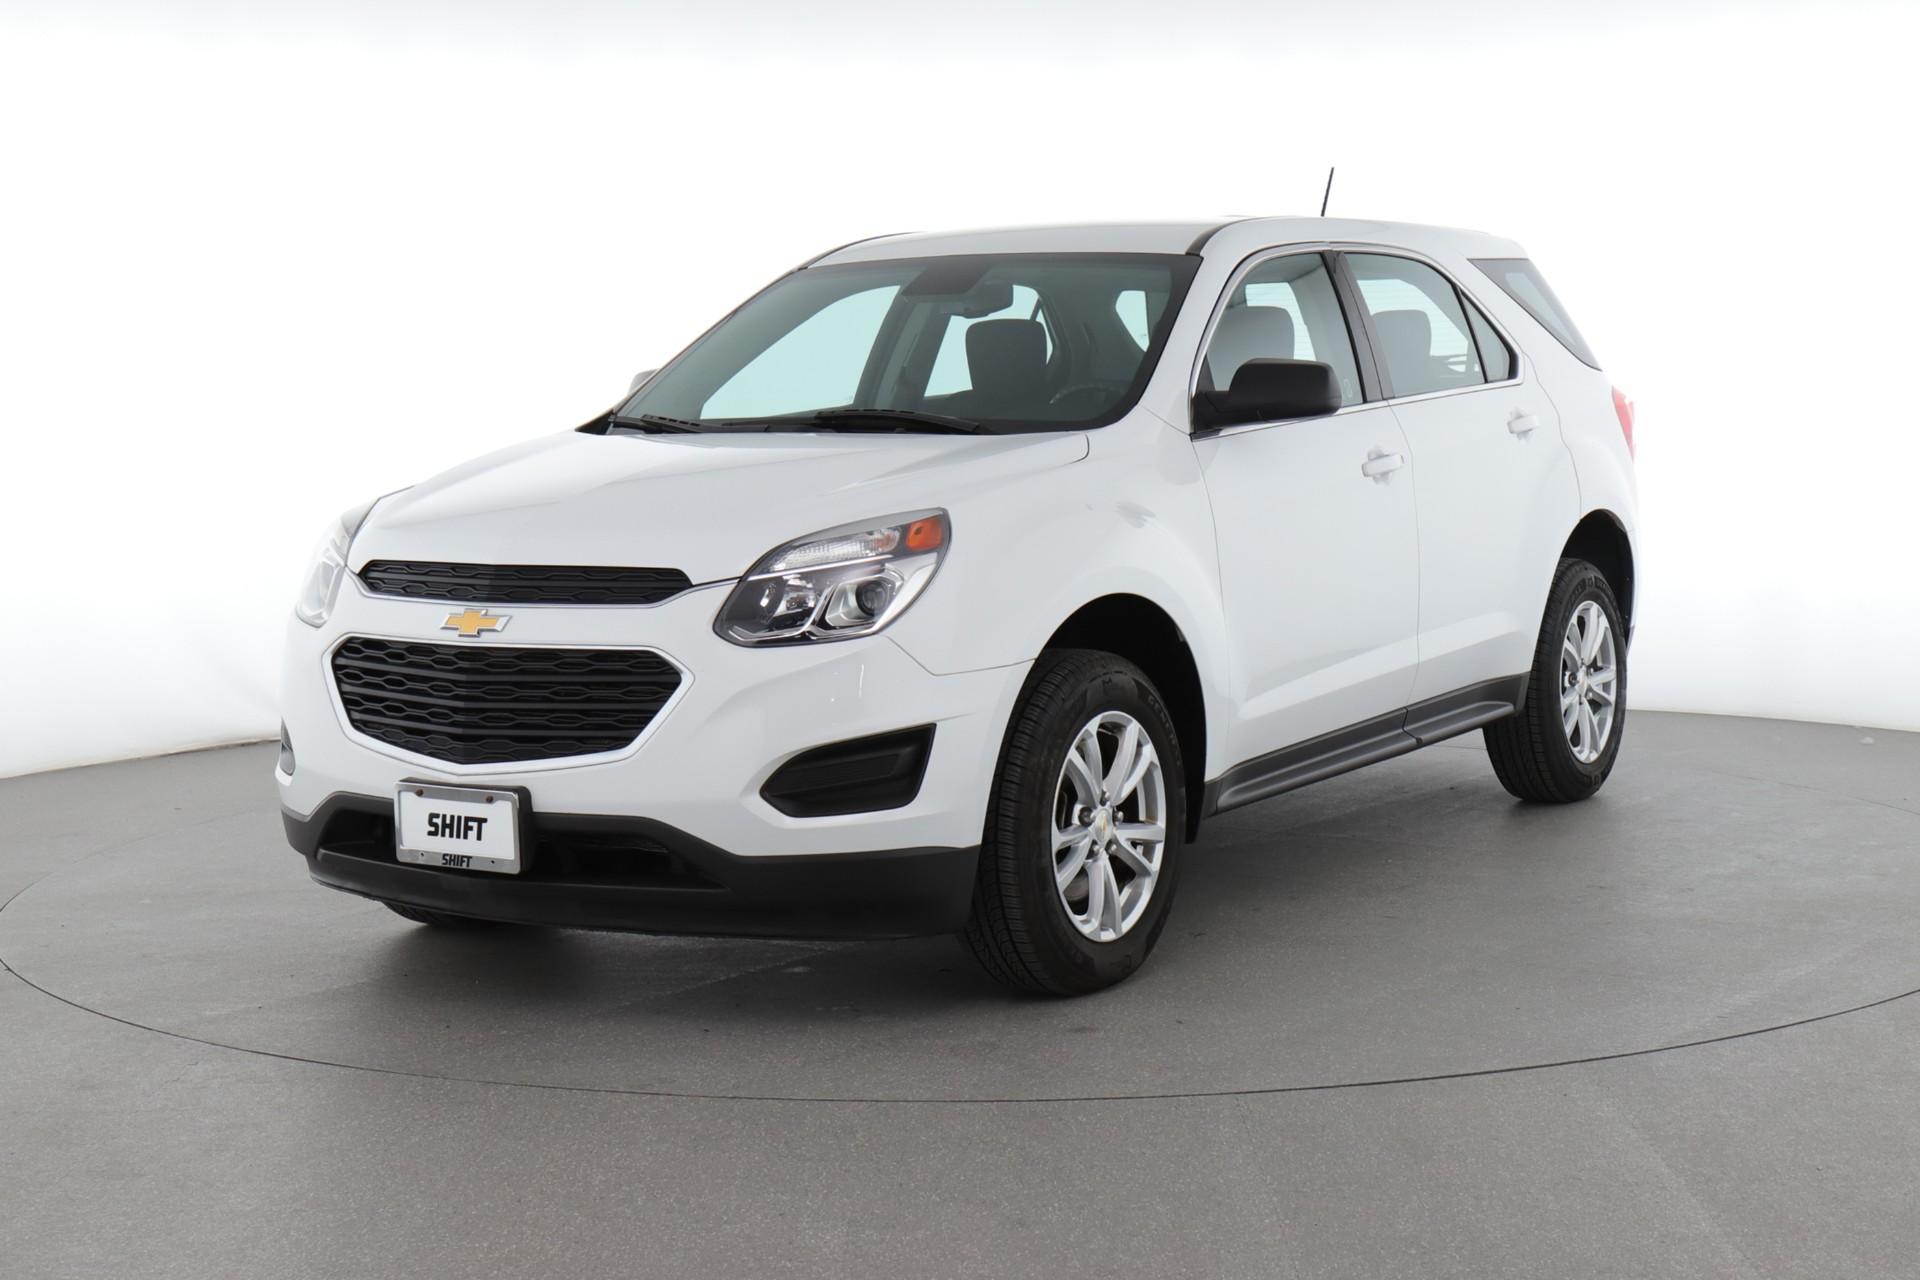 Chevrolet Equinox LS (from $19,450)